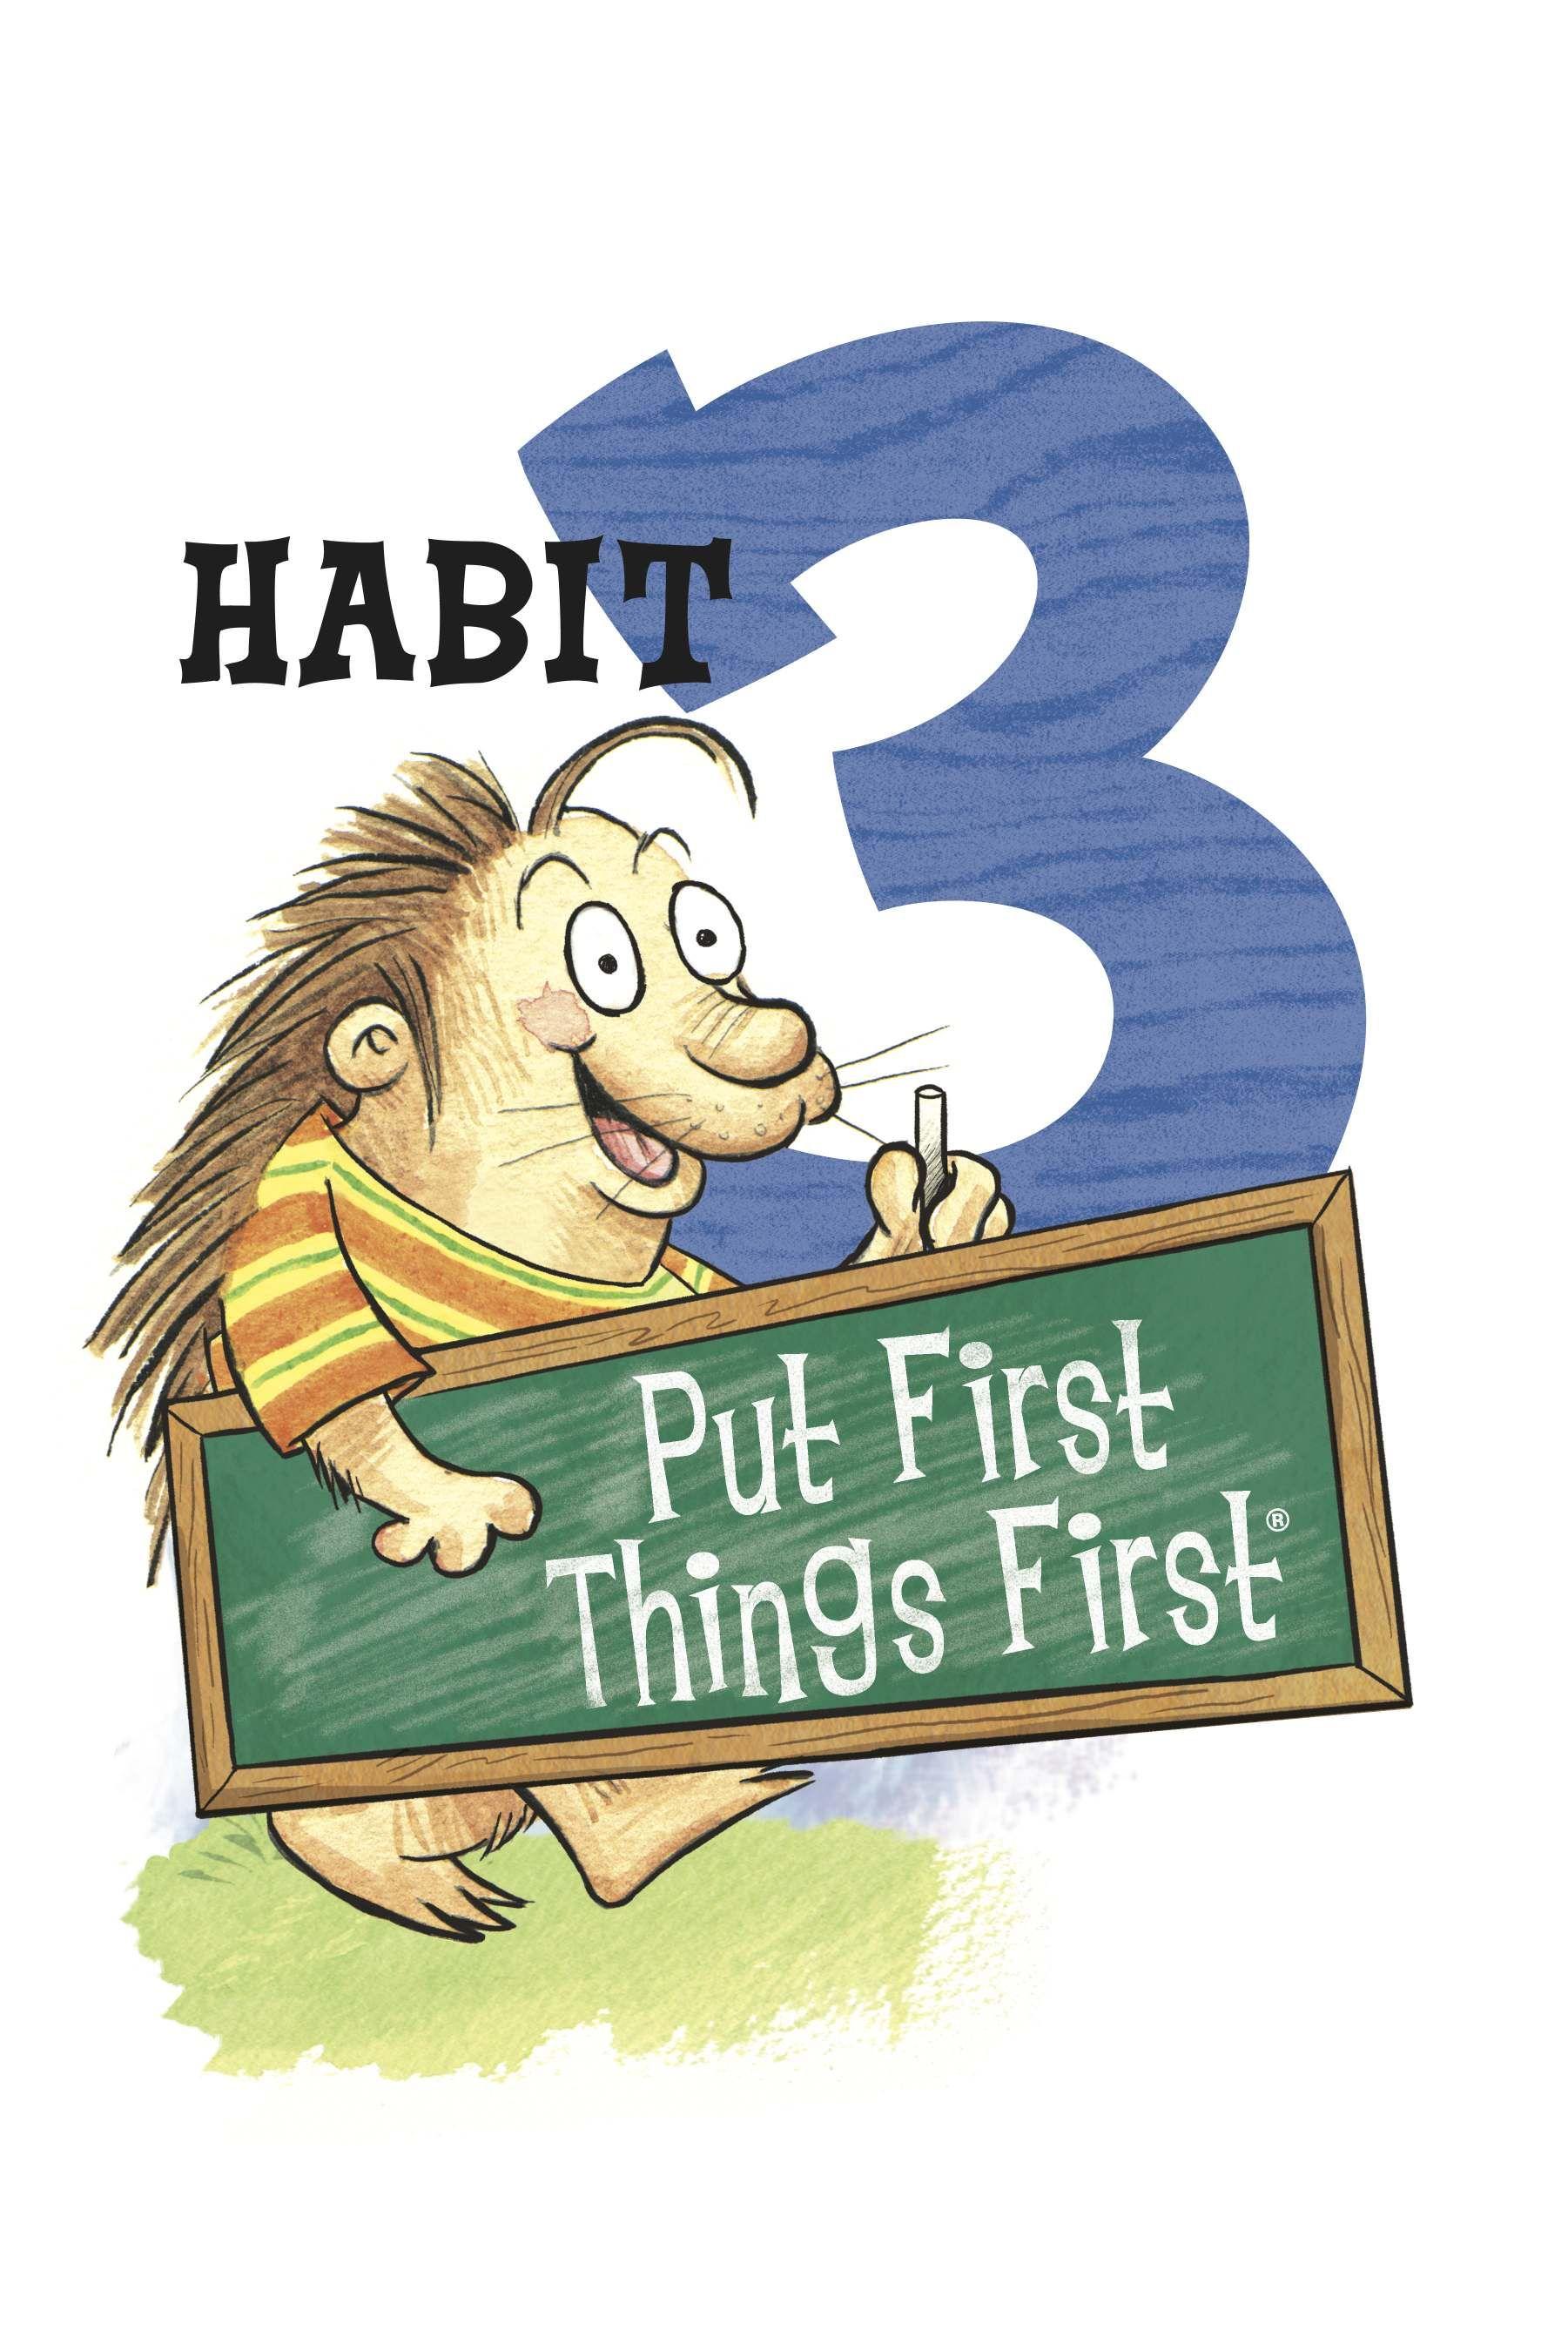 10 Negative Habits Your Family Needs To Kick